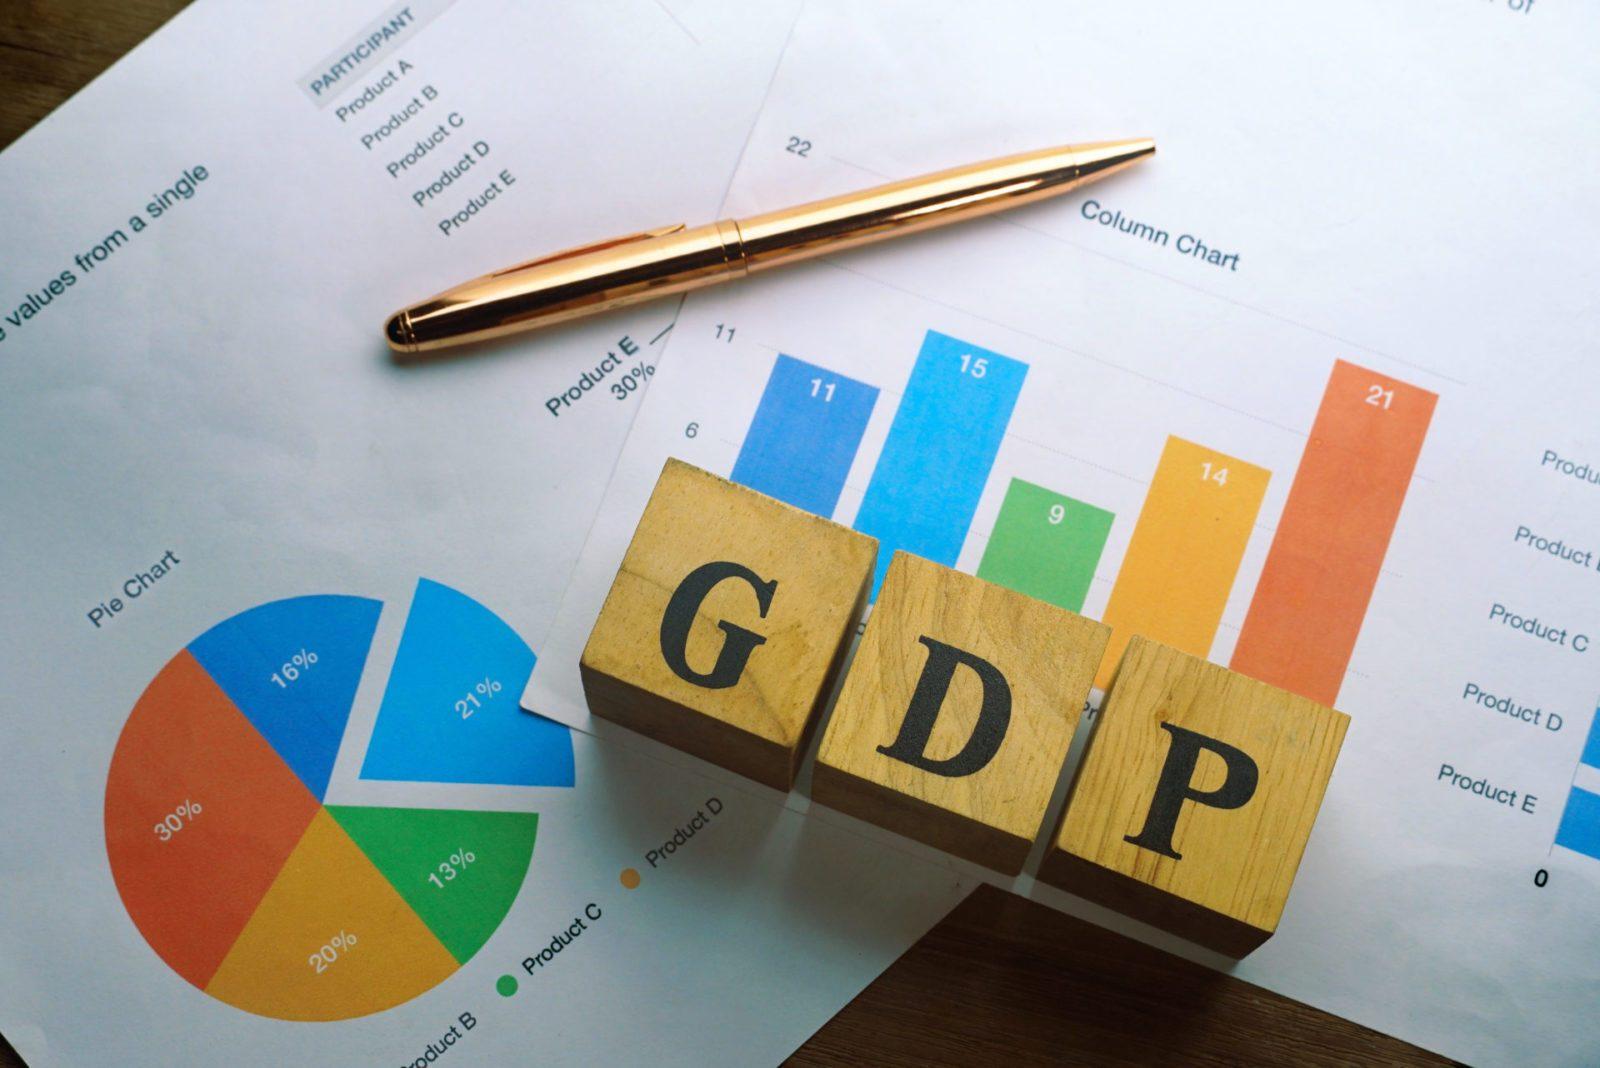 GDP data